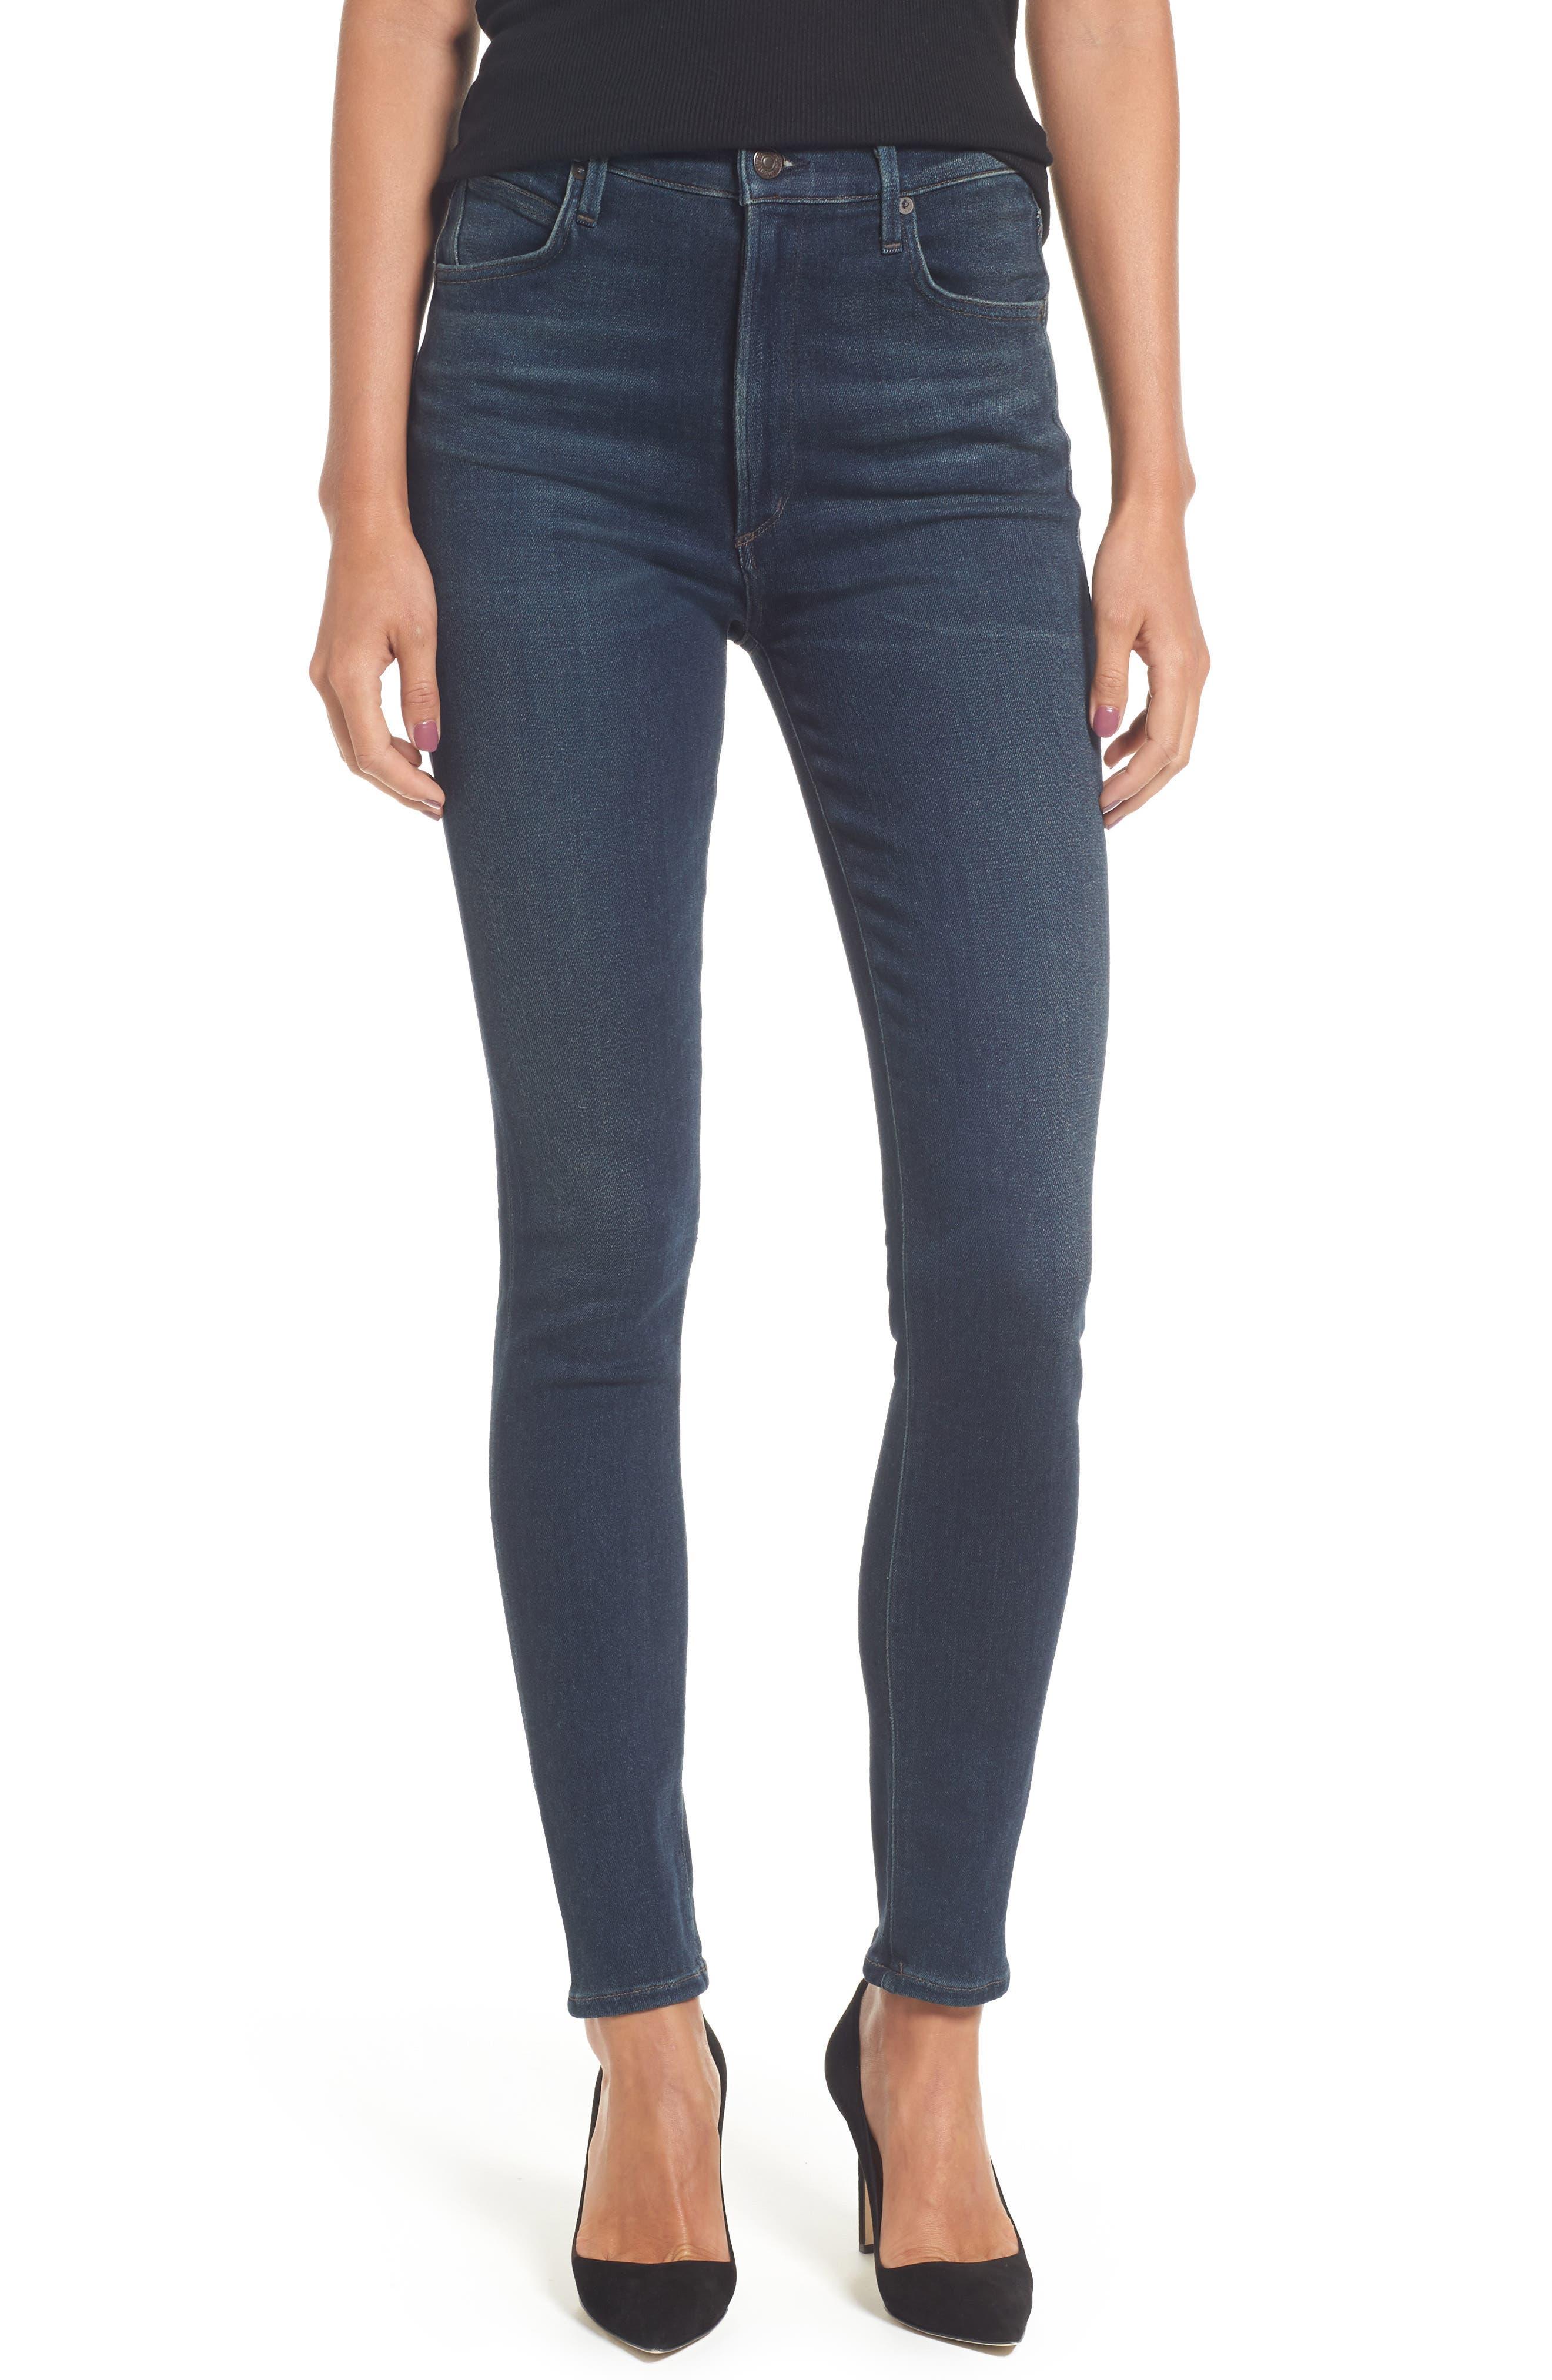 Citizens of Humanity Chrissy High Waist Skinny Jeans (Haze)